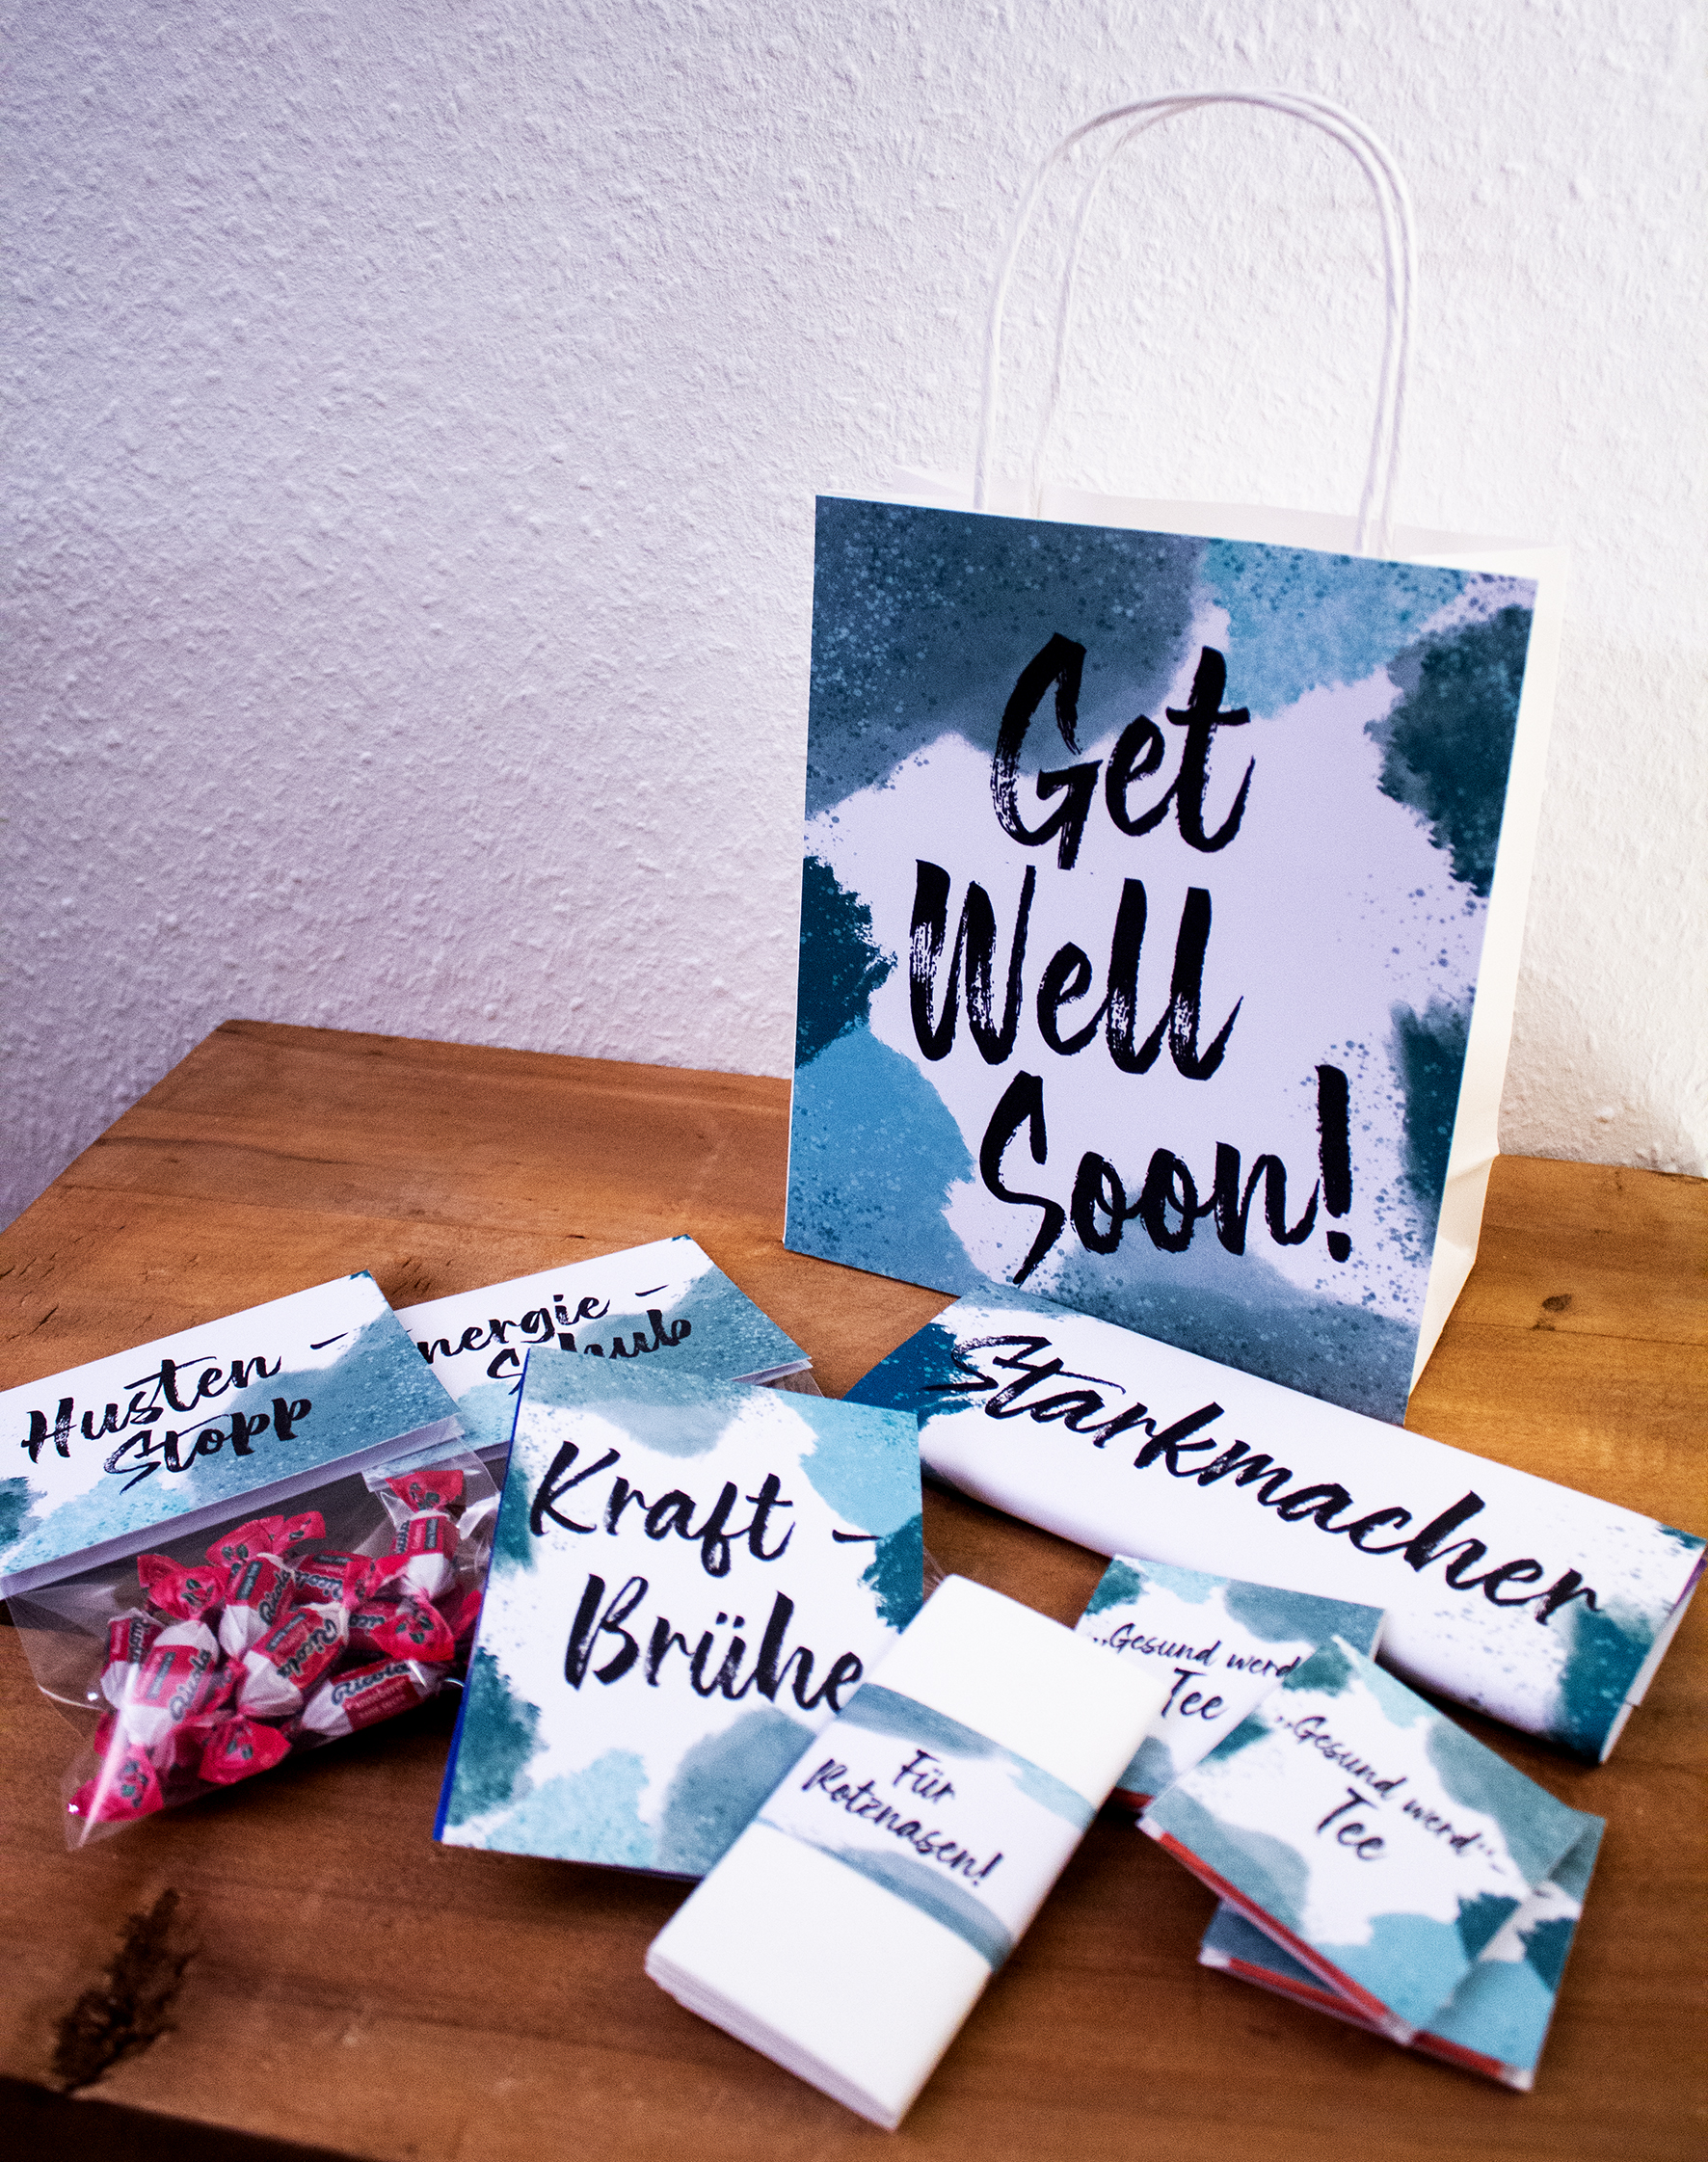 Get well soon_1